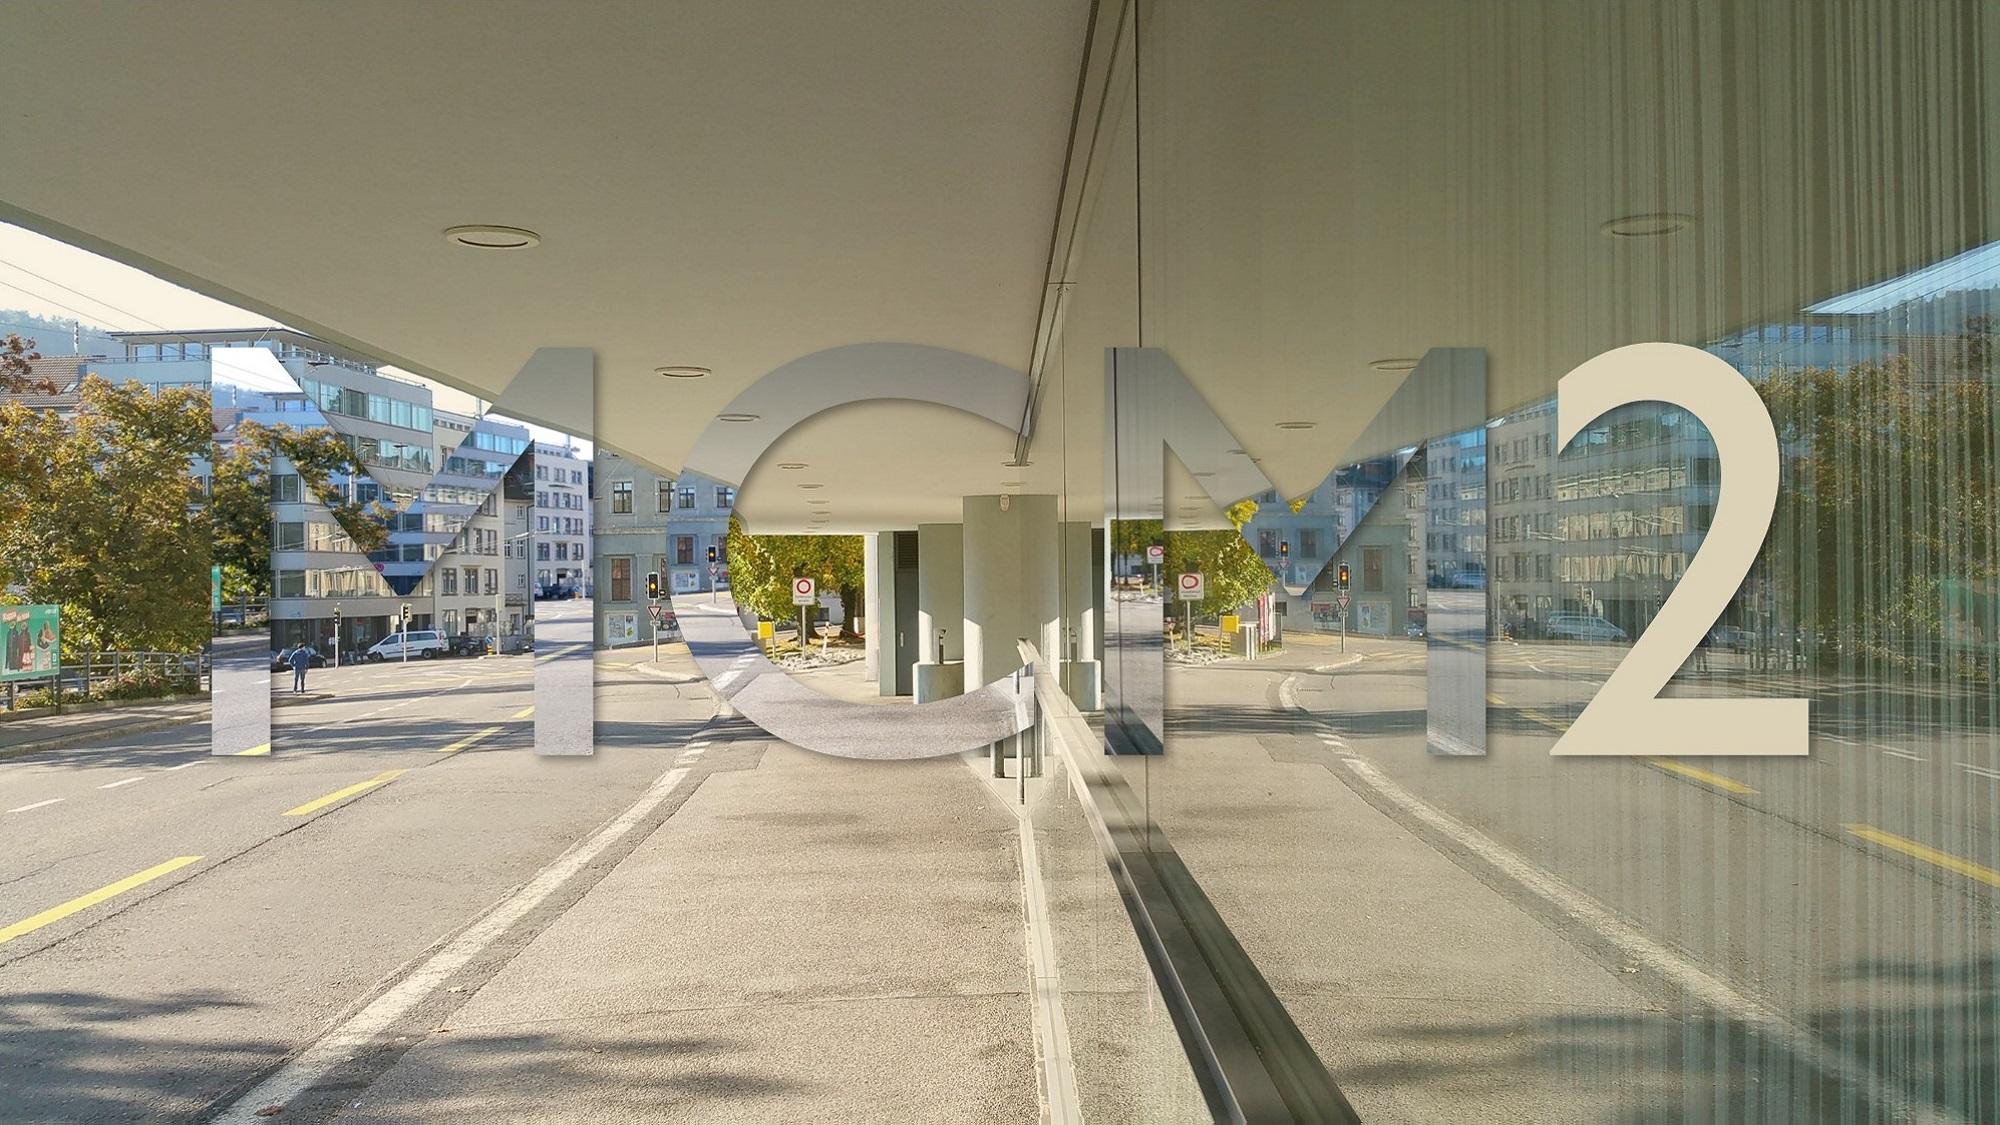 MCM2 Logo, street and glass window facade reflecting street